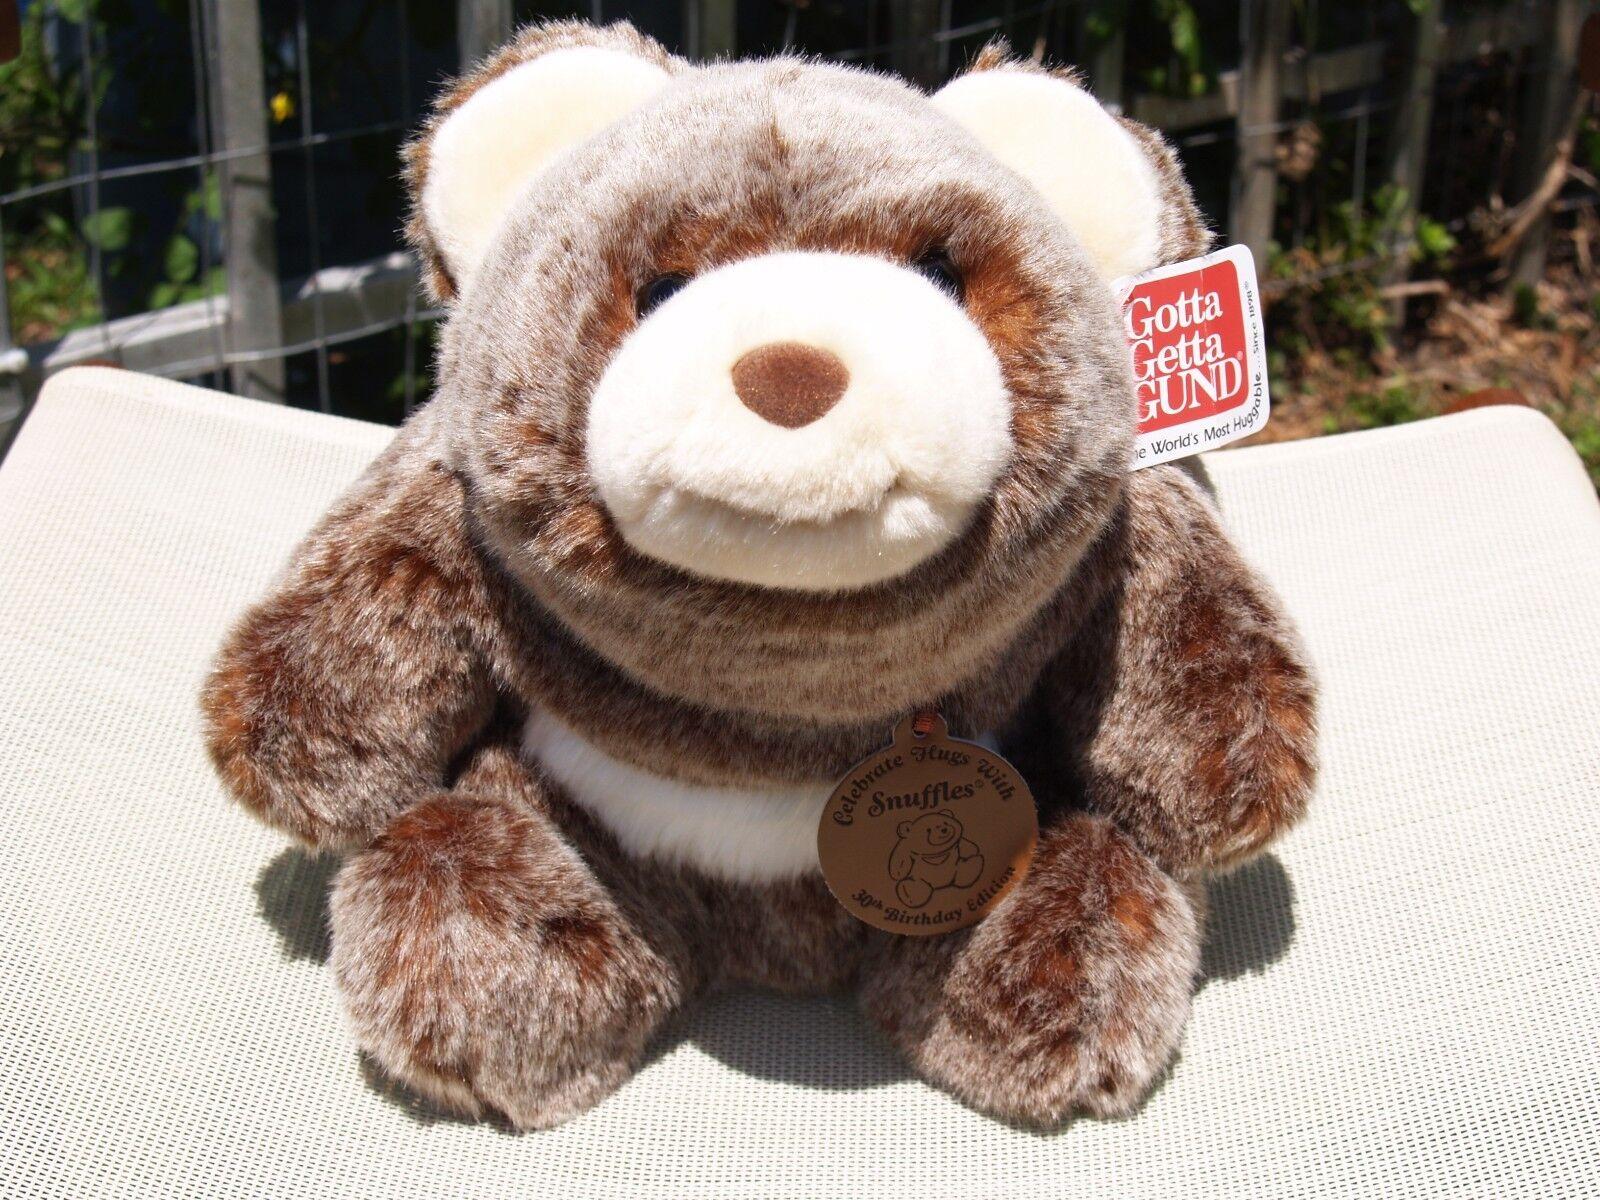 a4e1ce2088989 ULTRA RARE GUND - 30TH BIRTHDAY- 10 CHOCOLATE SNUFFLES BEAR- ALL TAGS